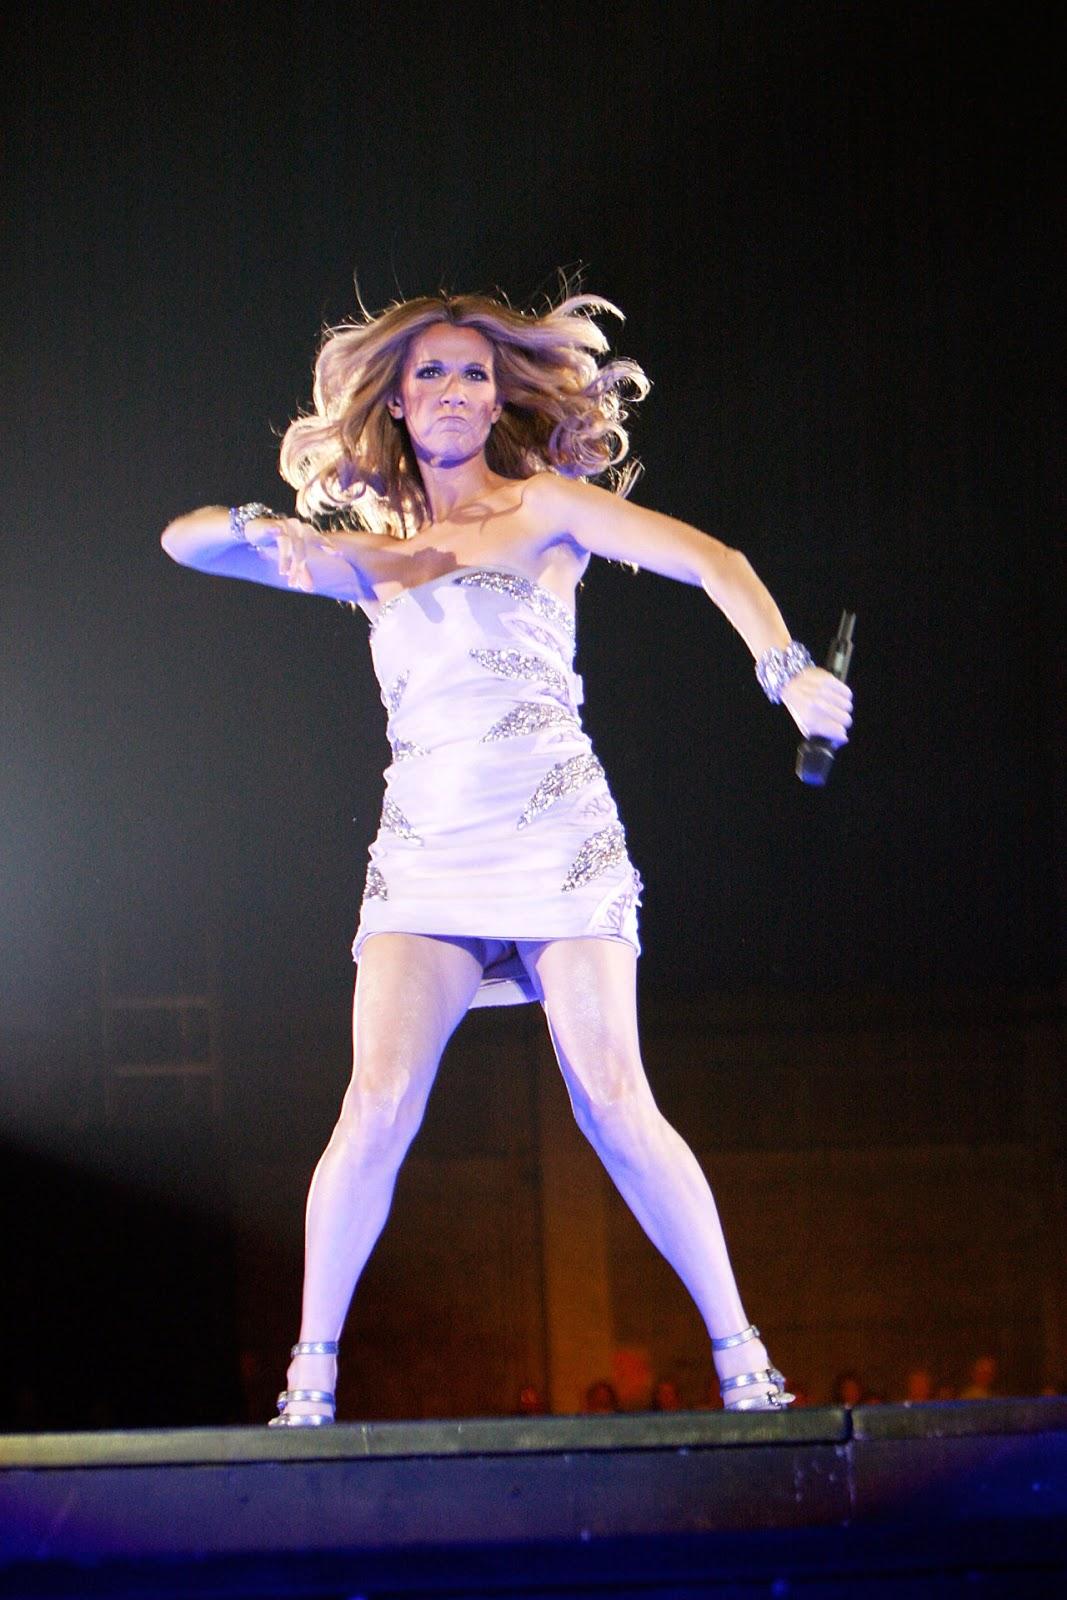 http://4.bp.blogspot.com/-kwnVVQhODdA/UI6Q-Mh8v9I/AAAAAAAAcLc/D-b3GB01mUw/s1600/celine-dion-dancing.jpg